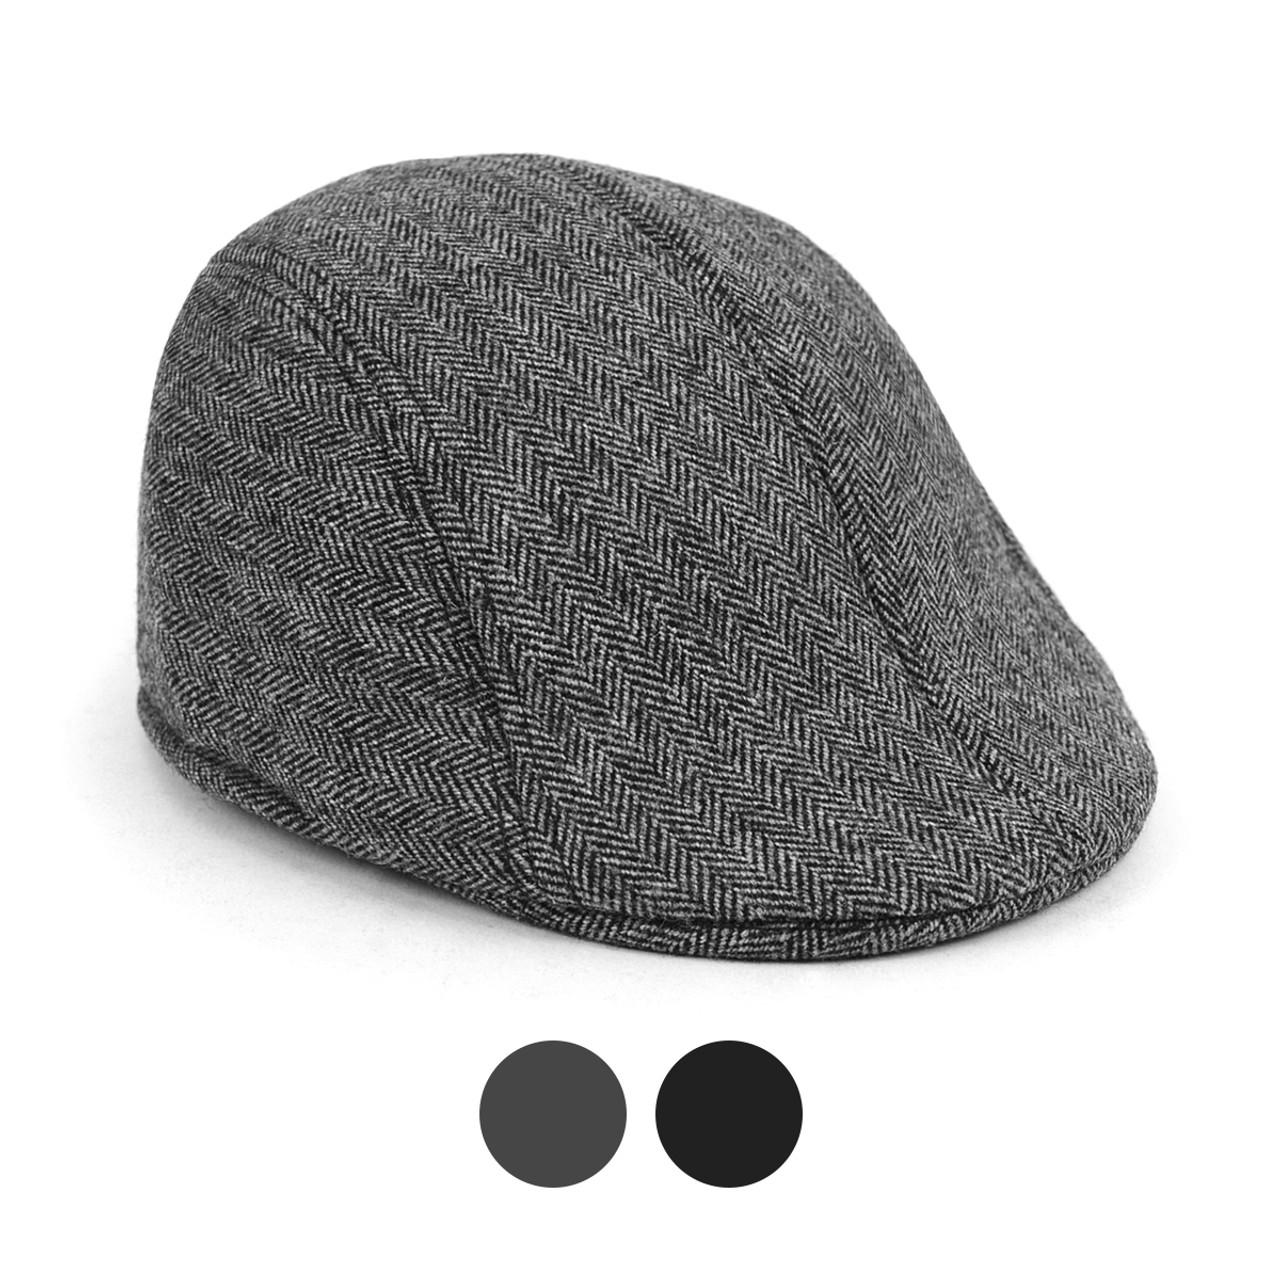 6pc Two Sizes Boy s Fall Winter Herringbone Ivy Hat - BIH10337 ... f248c91d6a3